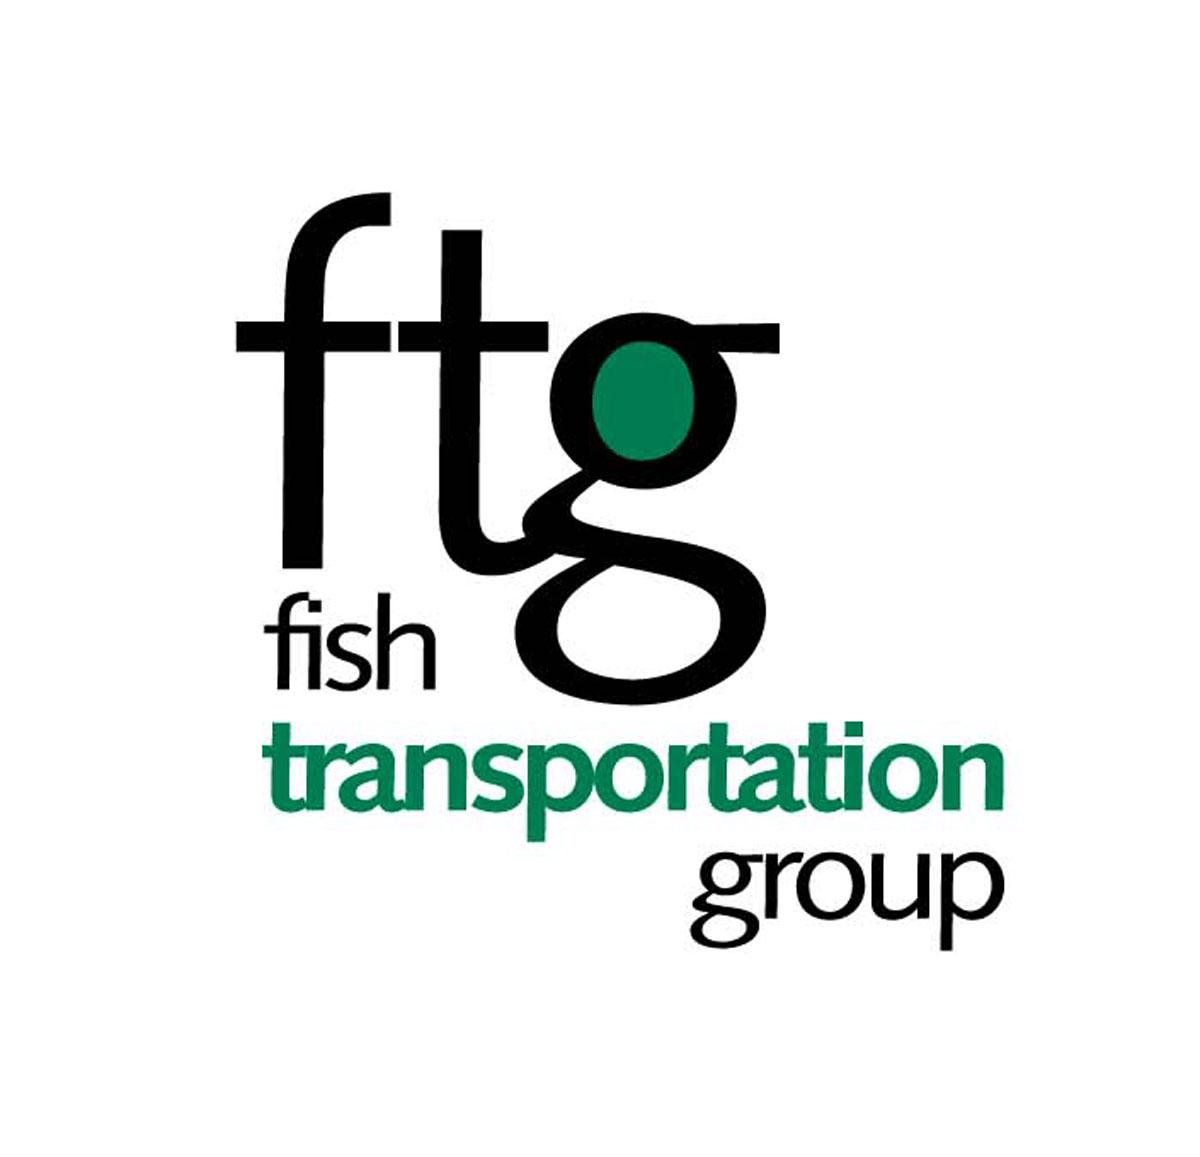 Fish Transportation Group